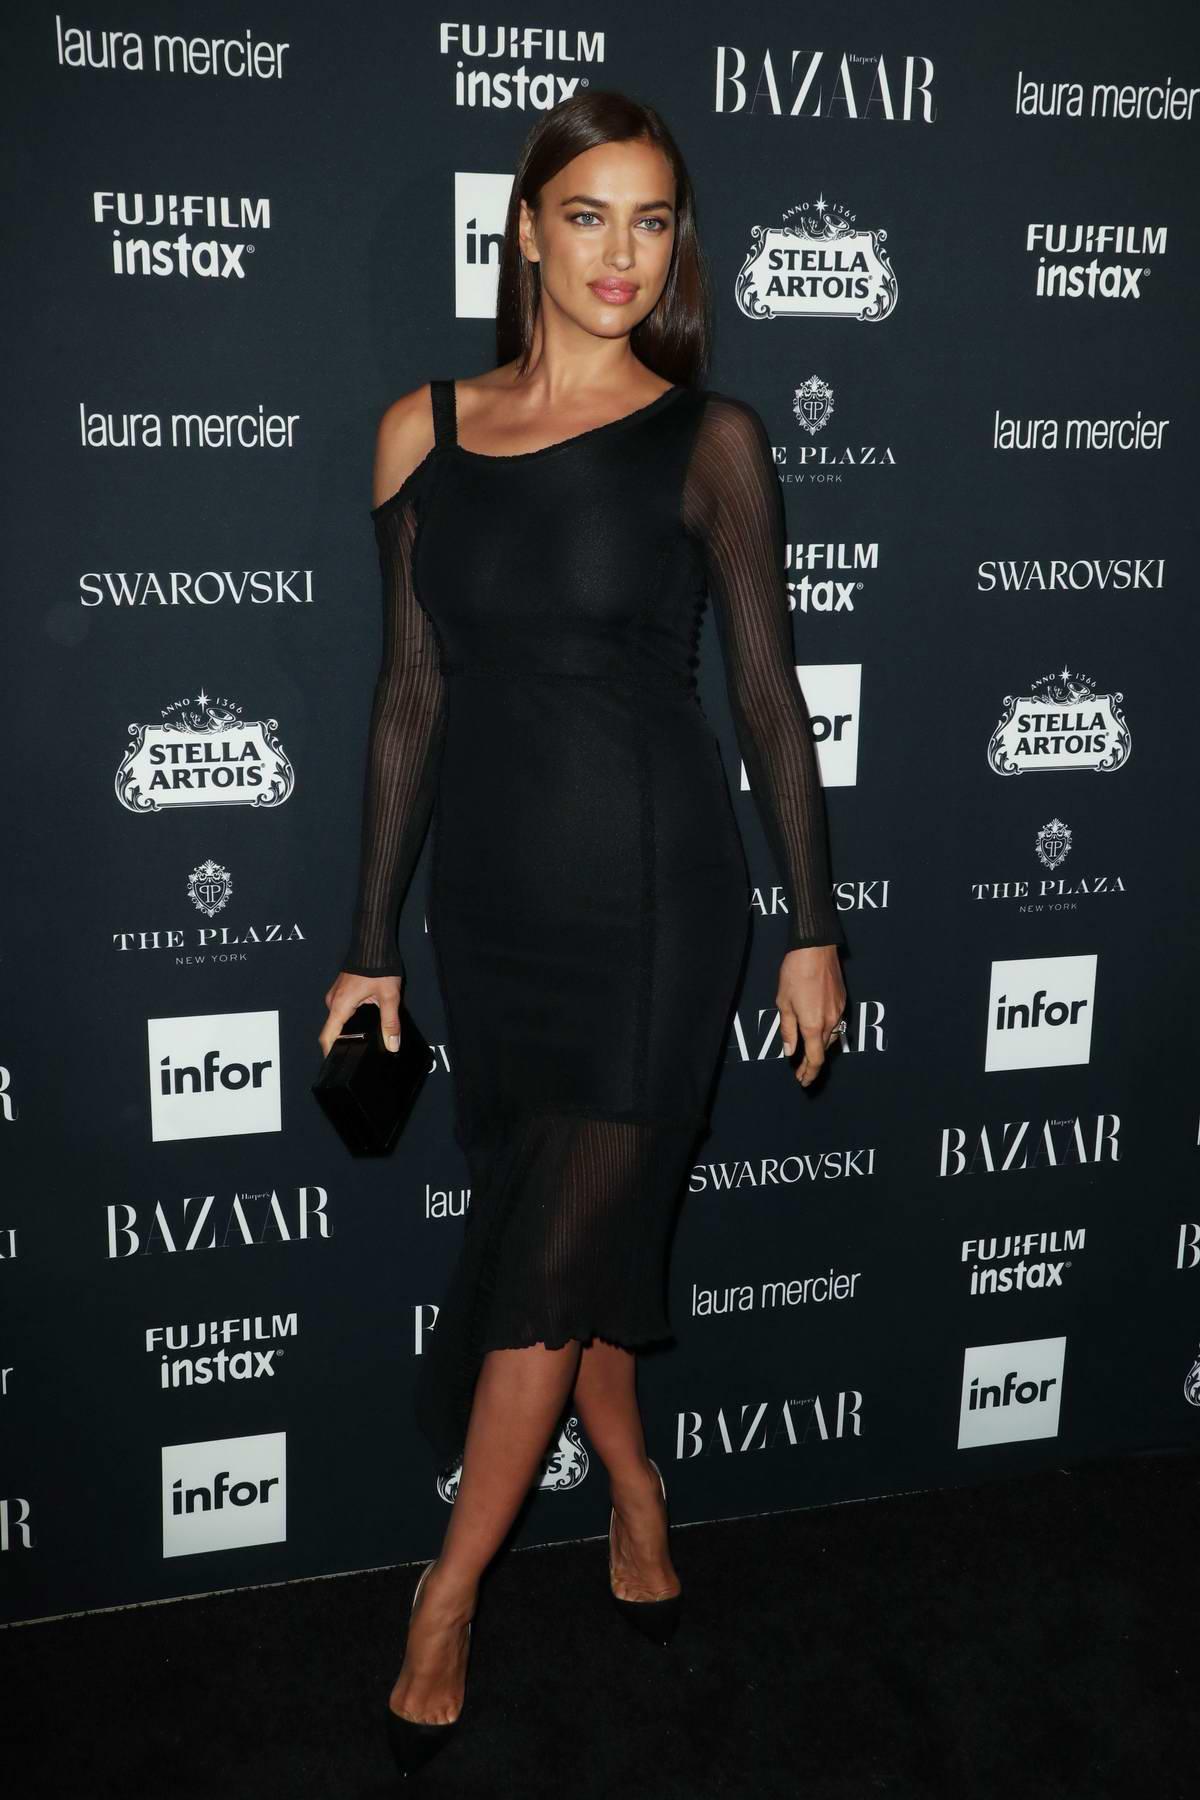 Irina Shayk at the Harper's Bazaar ICONS party at New York Fashion Week